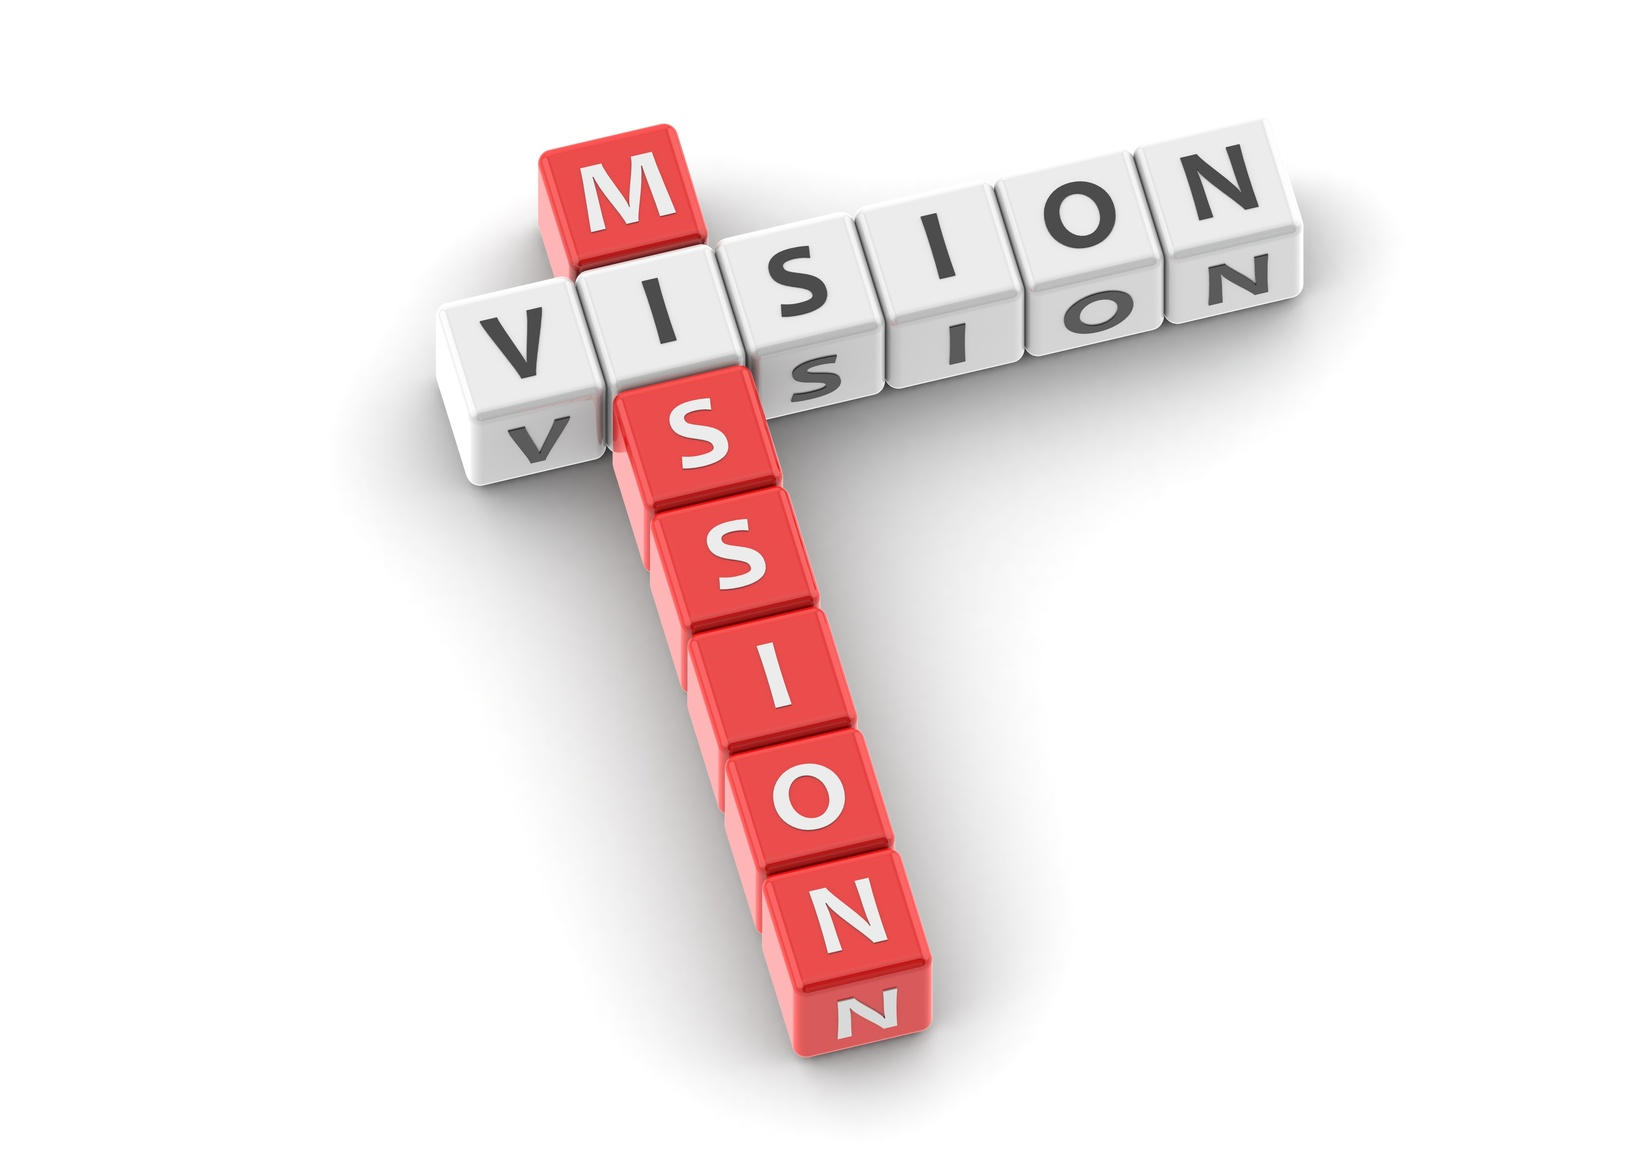 forex mission vision statement